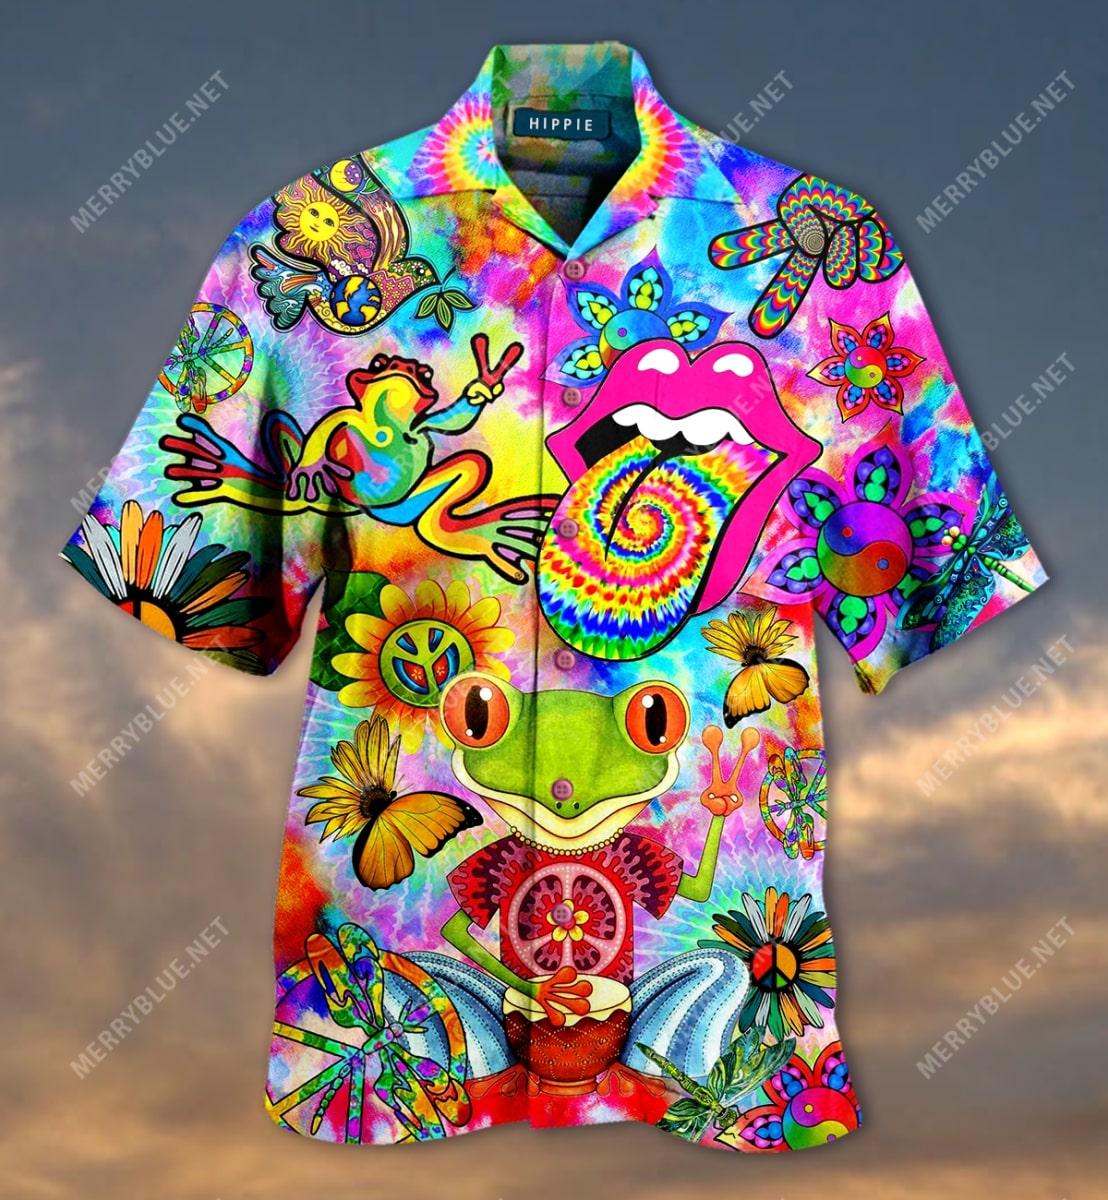 hippie feeling groovy colorful all over printed hawaiian shirt 4